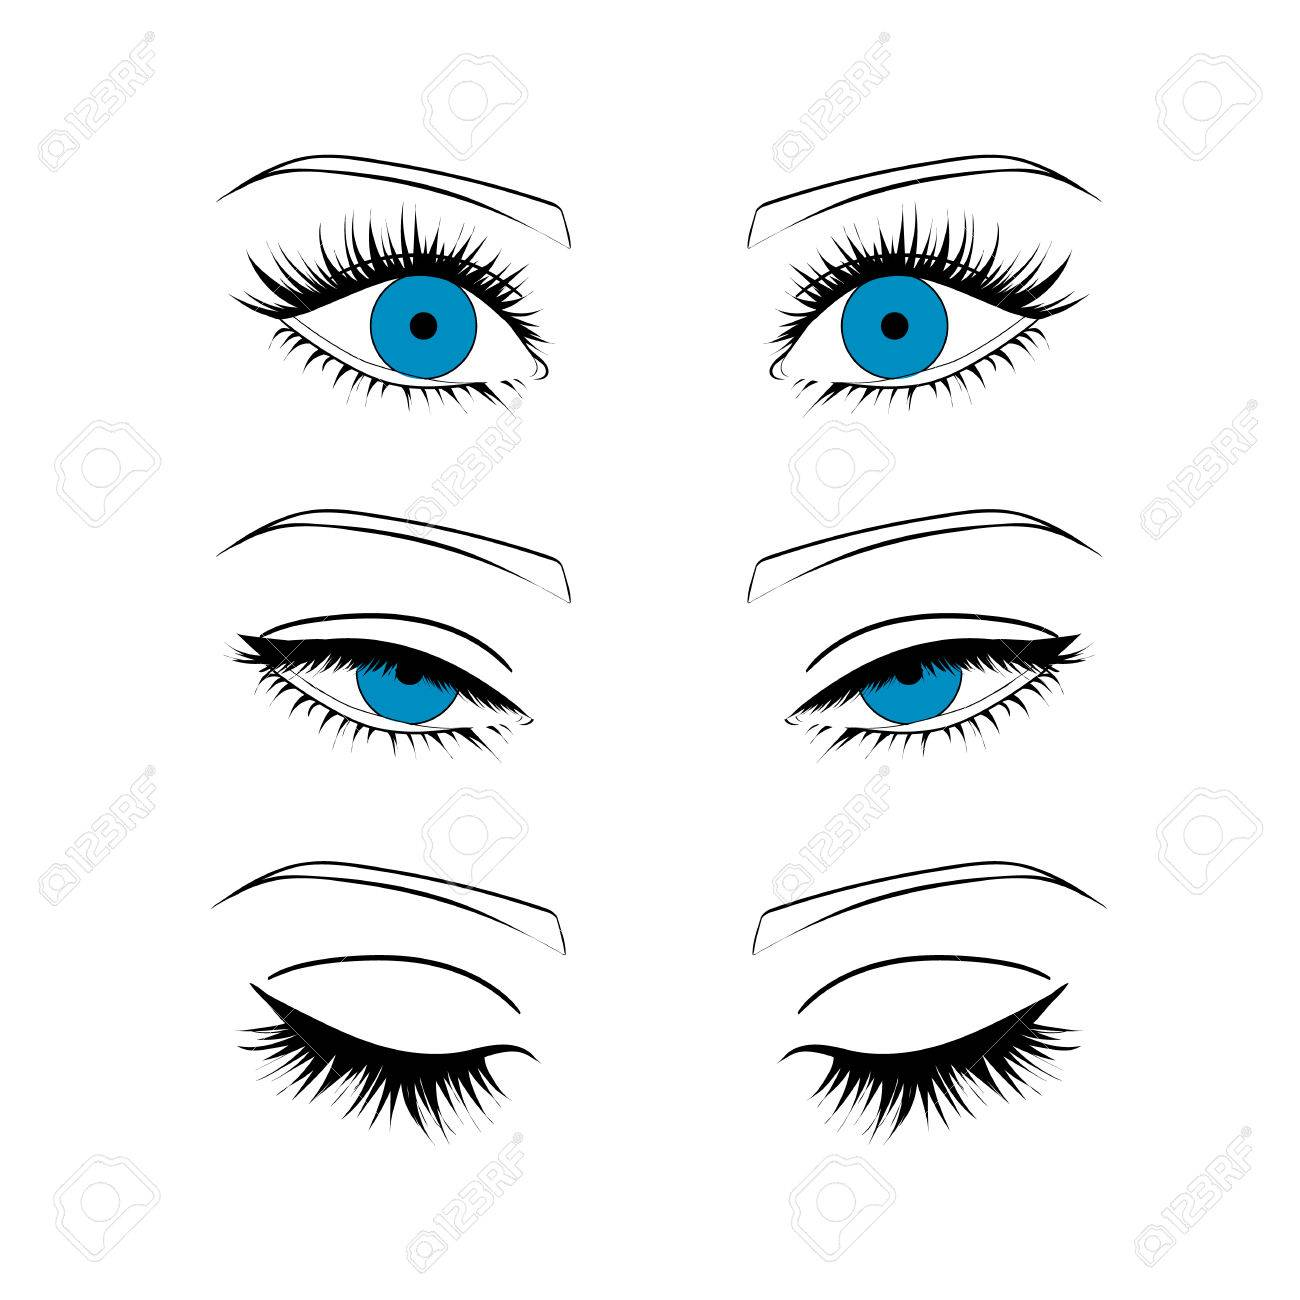 Open, closed half-open eyes Stock Vector - 61119103